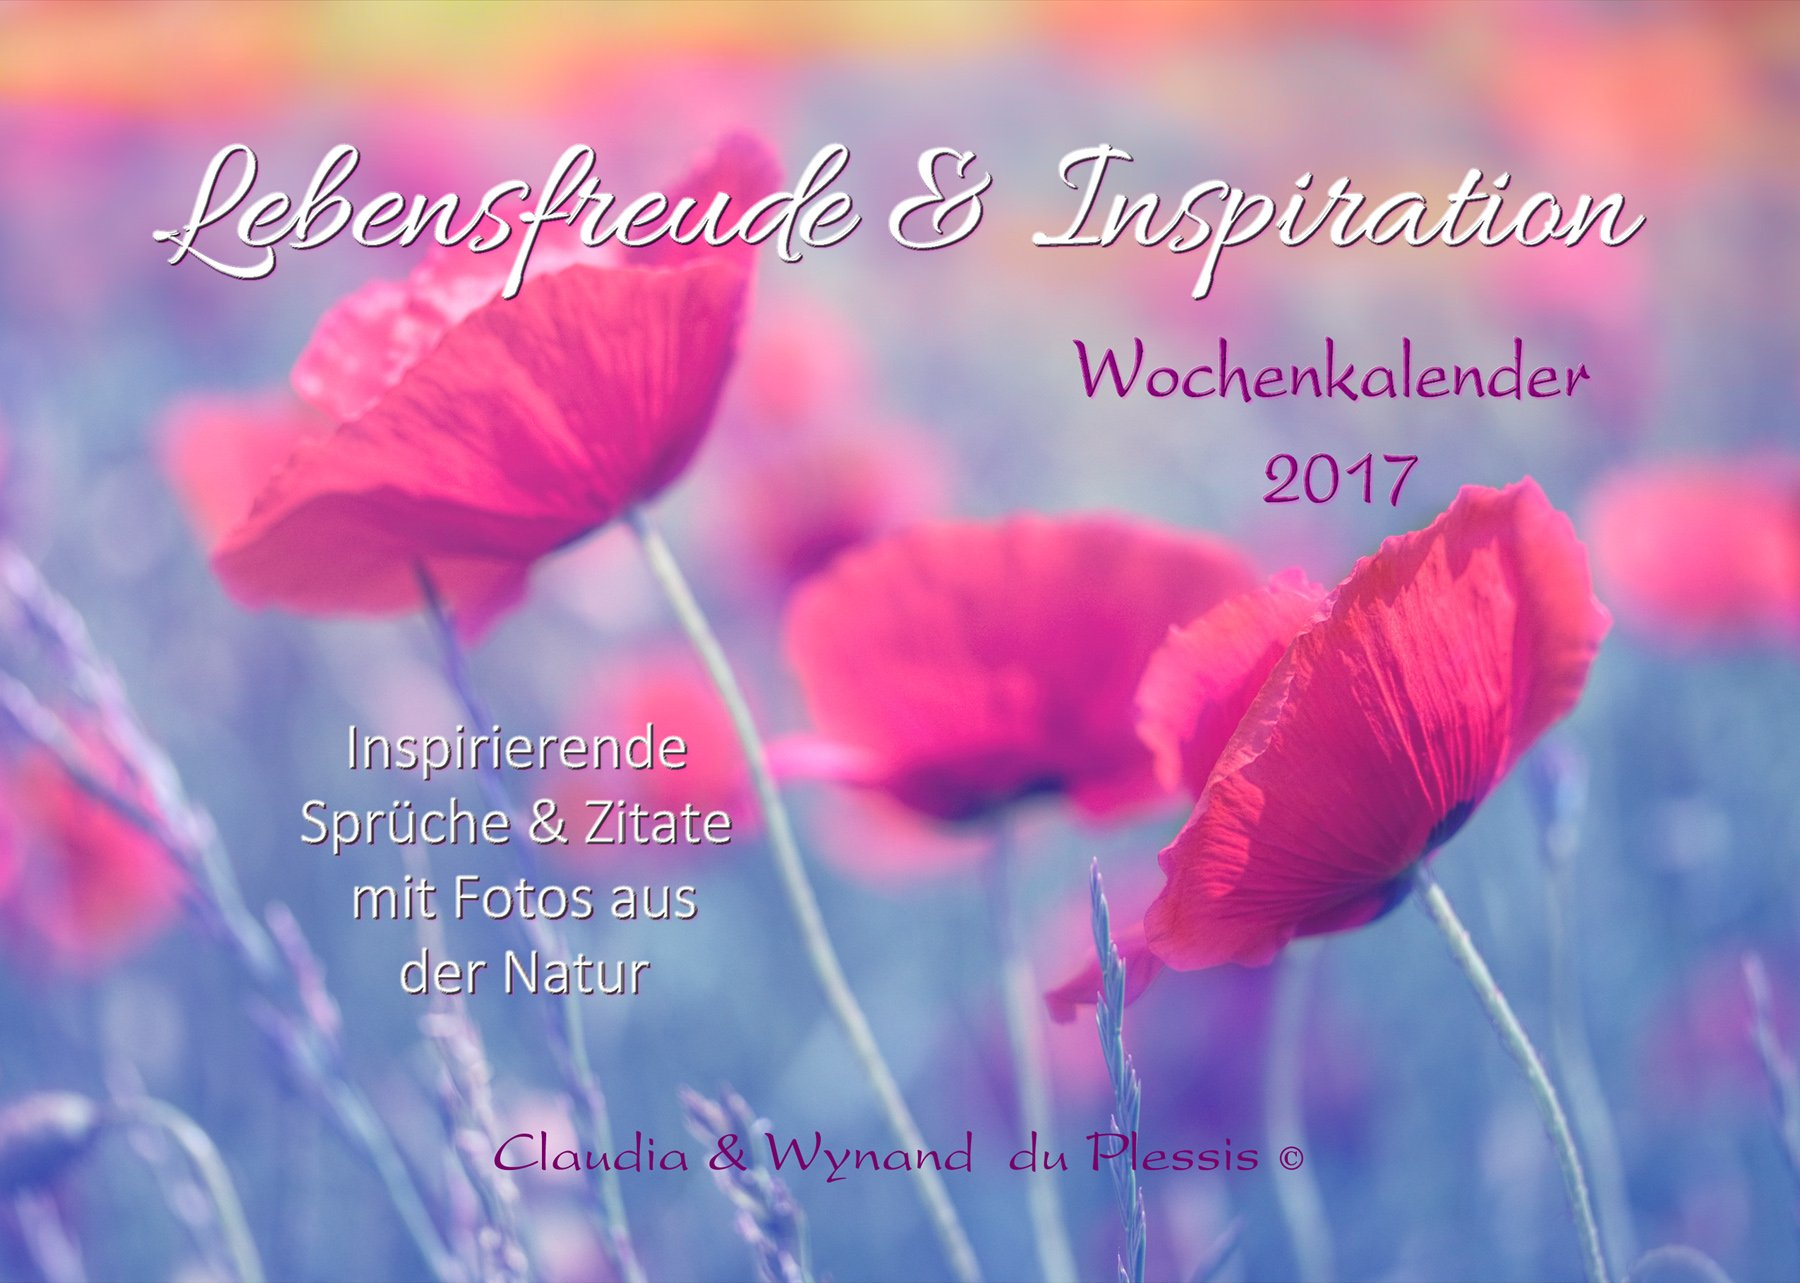 LEBENSFREUDE & INSPIRATION 2017 Wochenkalender: Inspirierende